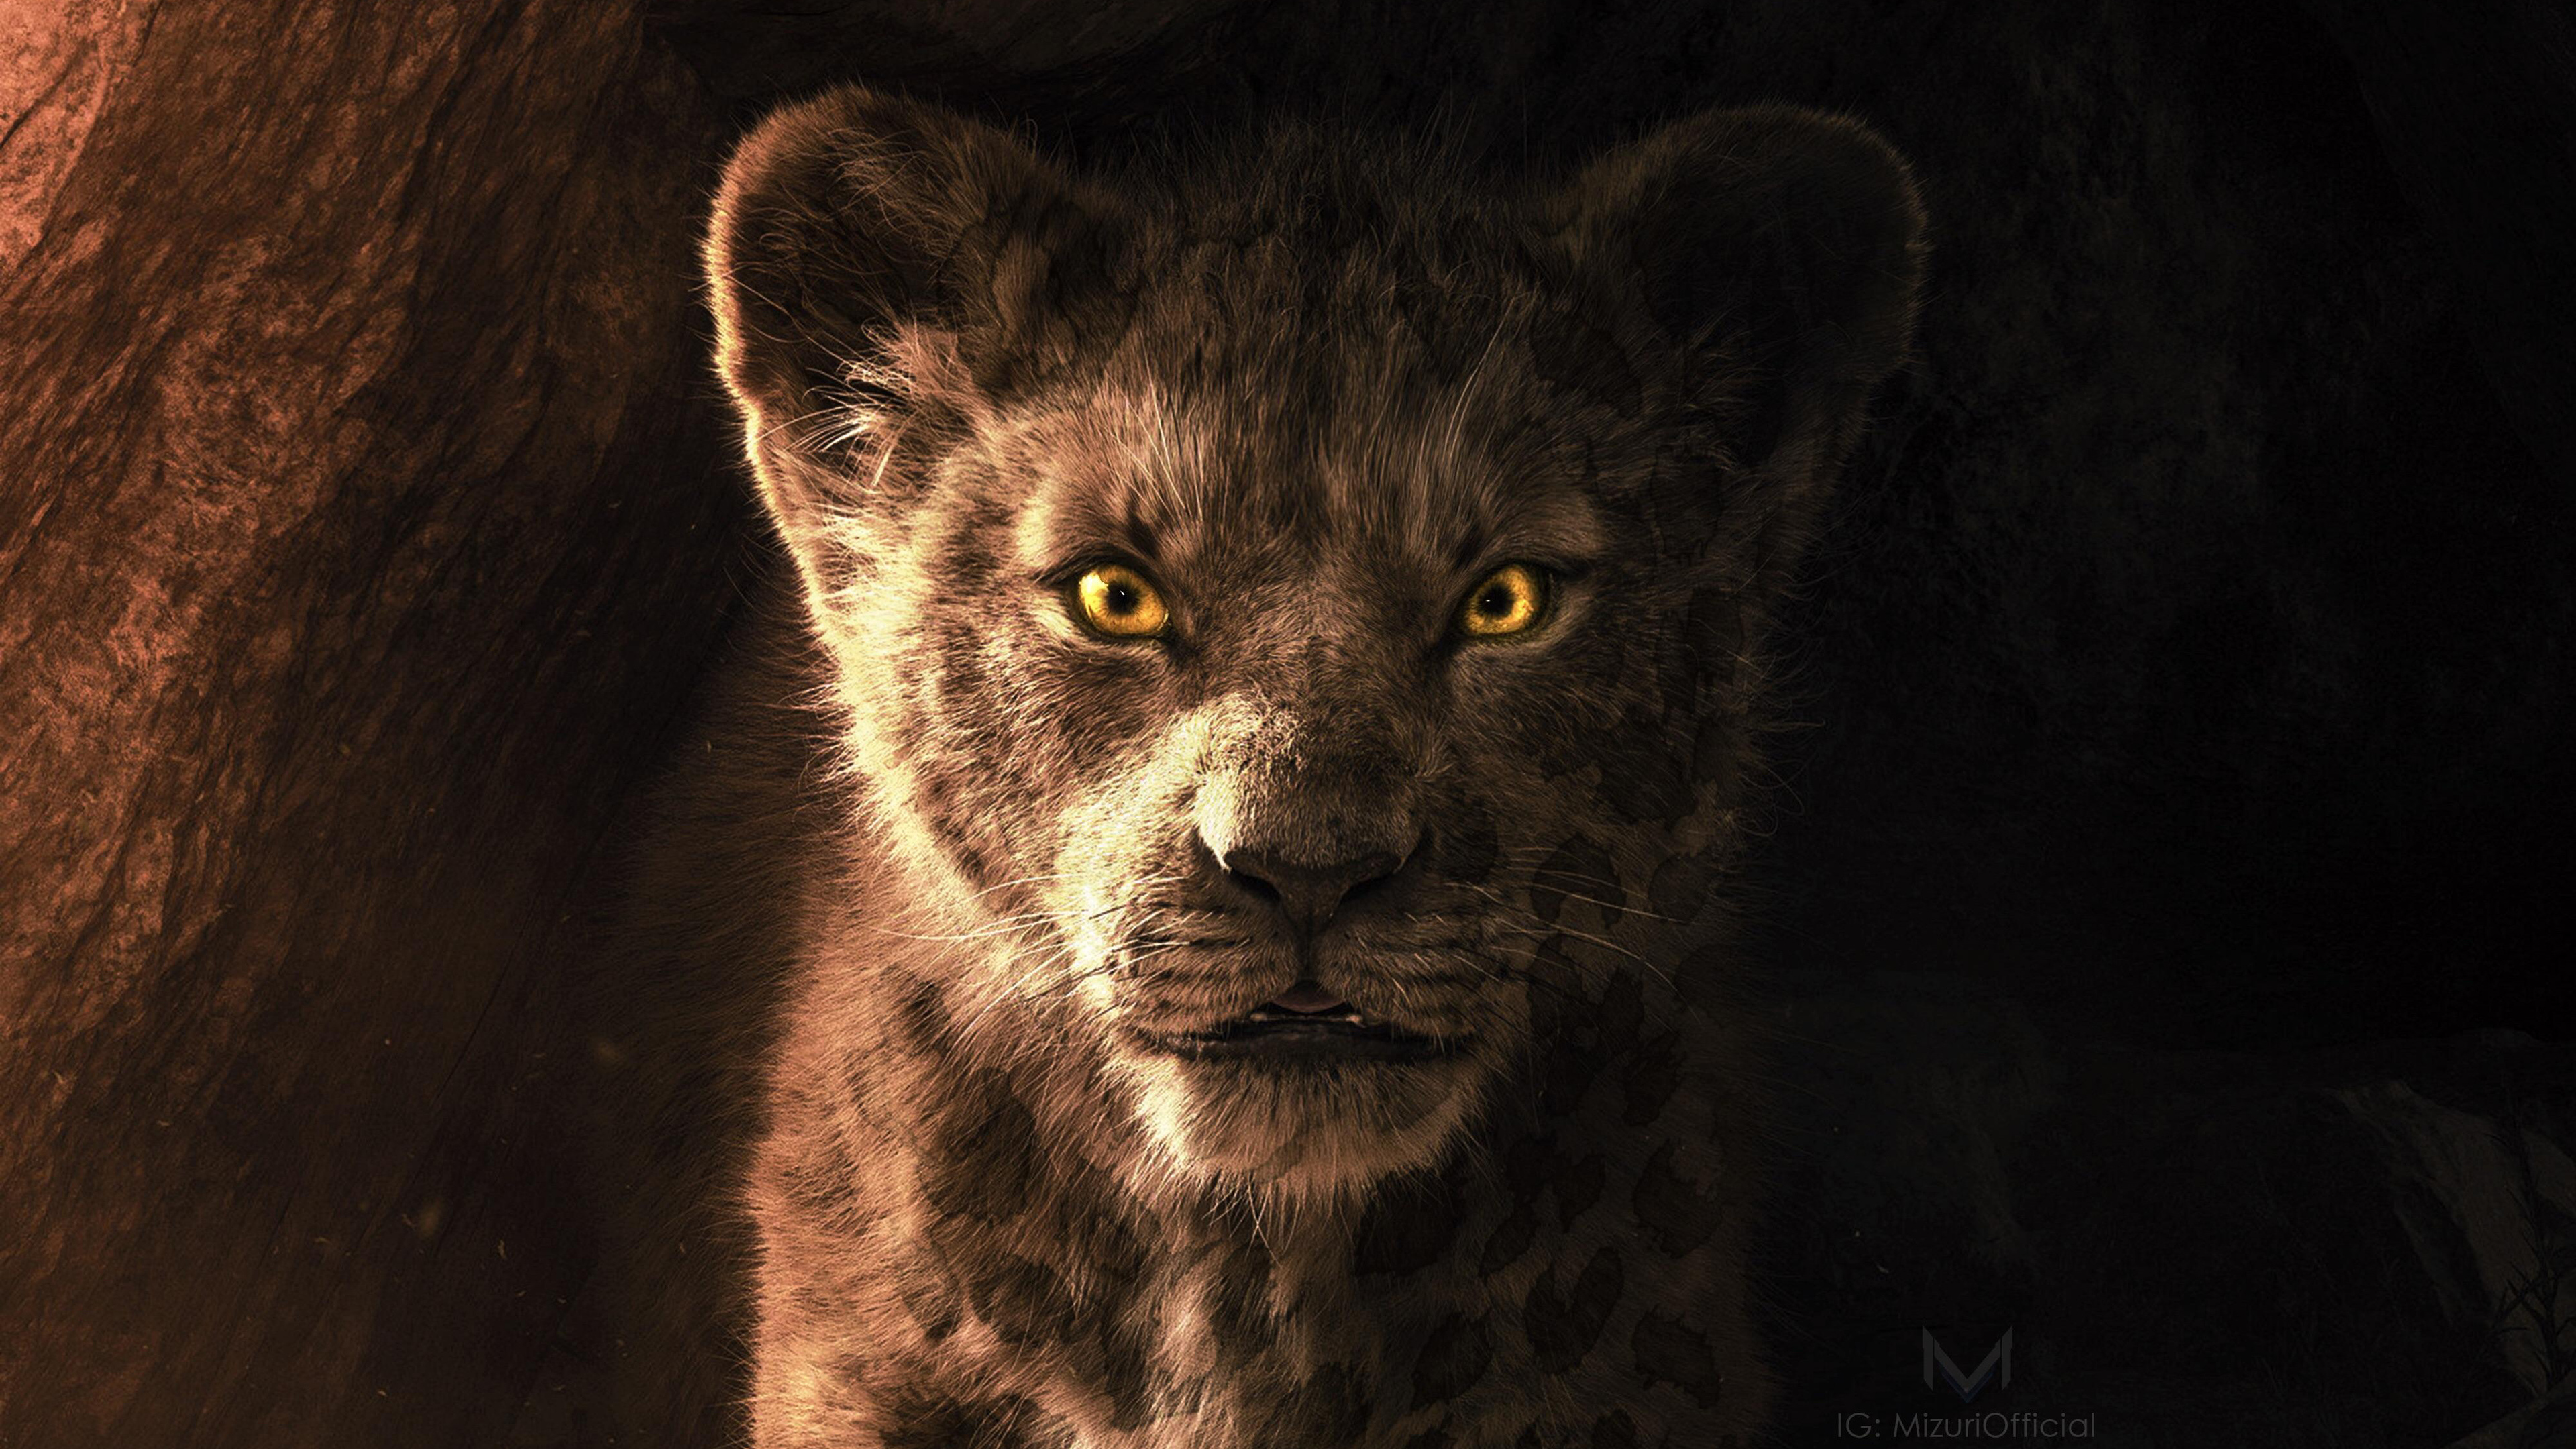 Wallpaper 4k The Lion King Simba 4k 2019 Movies Wallpapers 4k